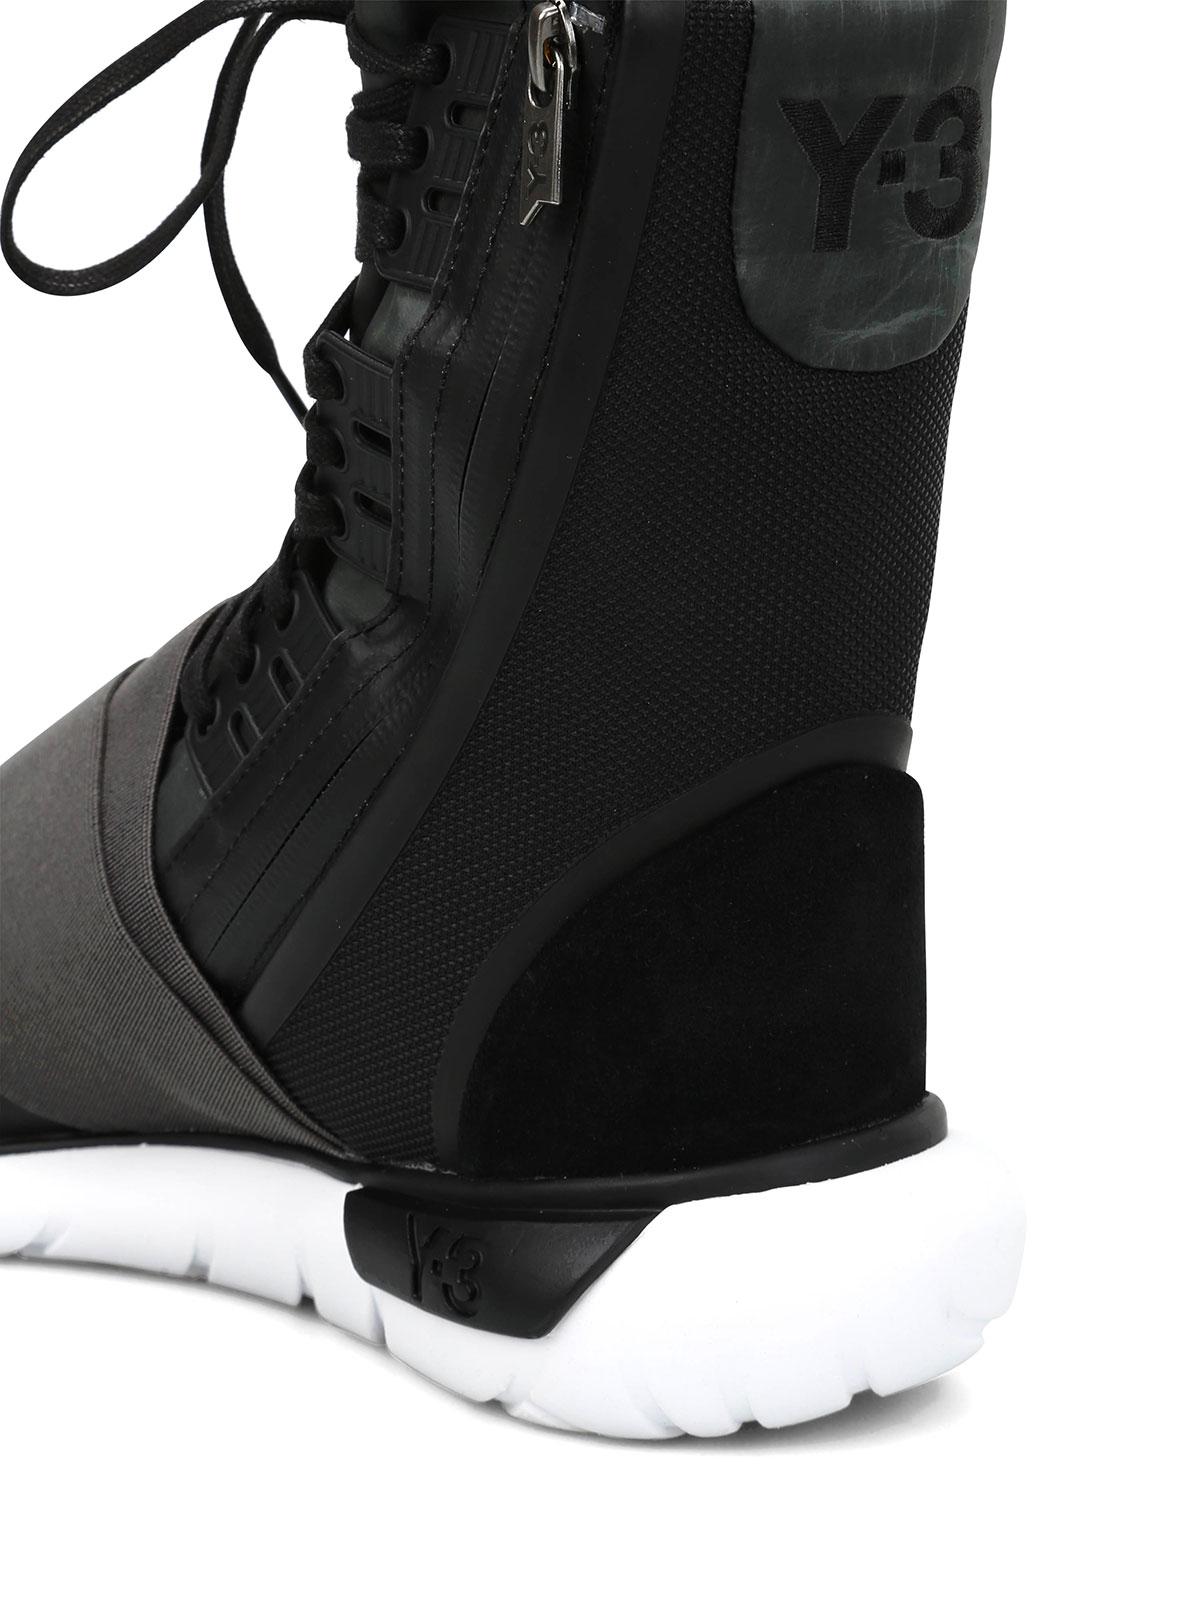 969c7e00e Adidas Y-3 - Qasa Boot multifabric sneakers - Sneaker - BB4803 ...